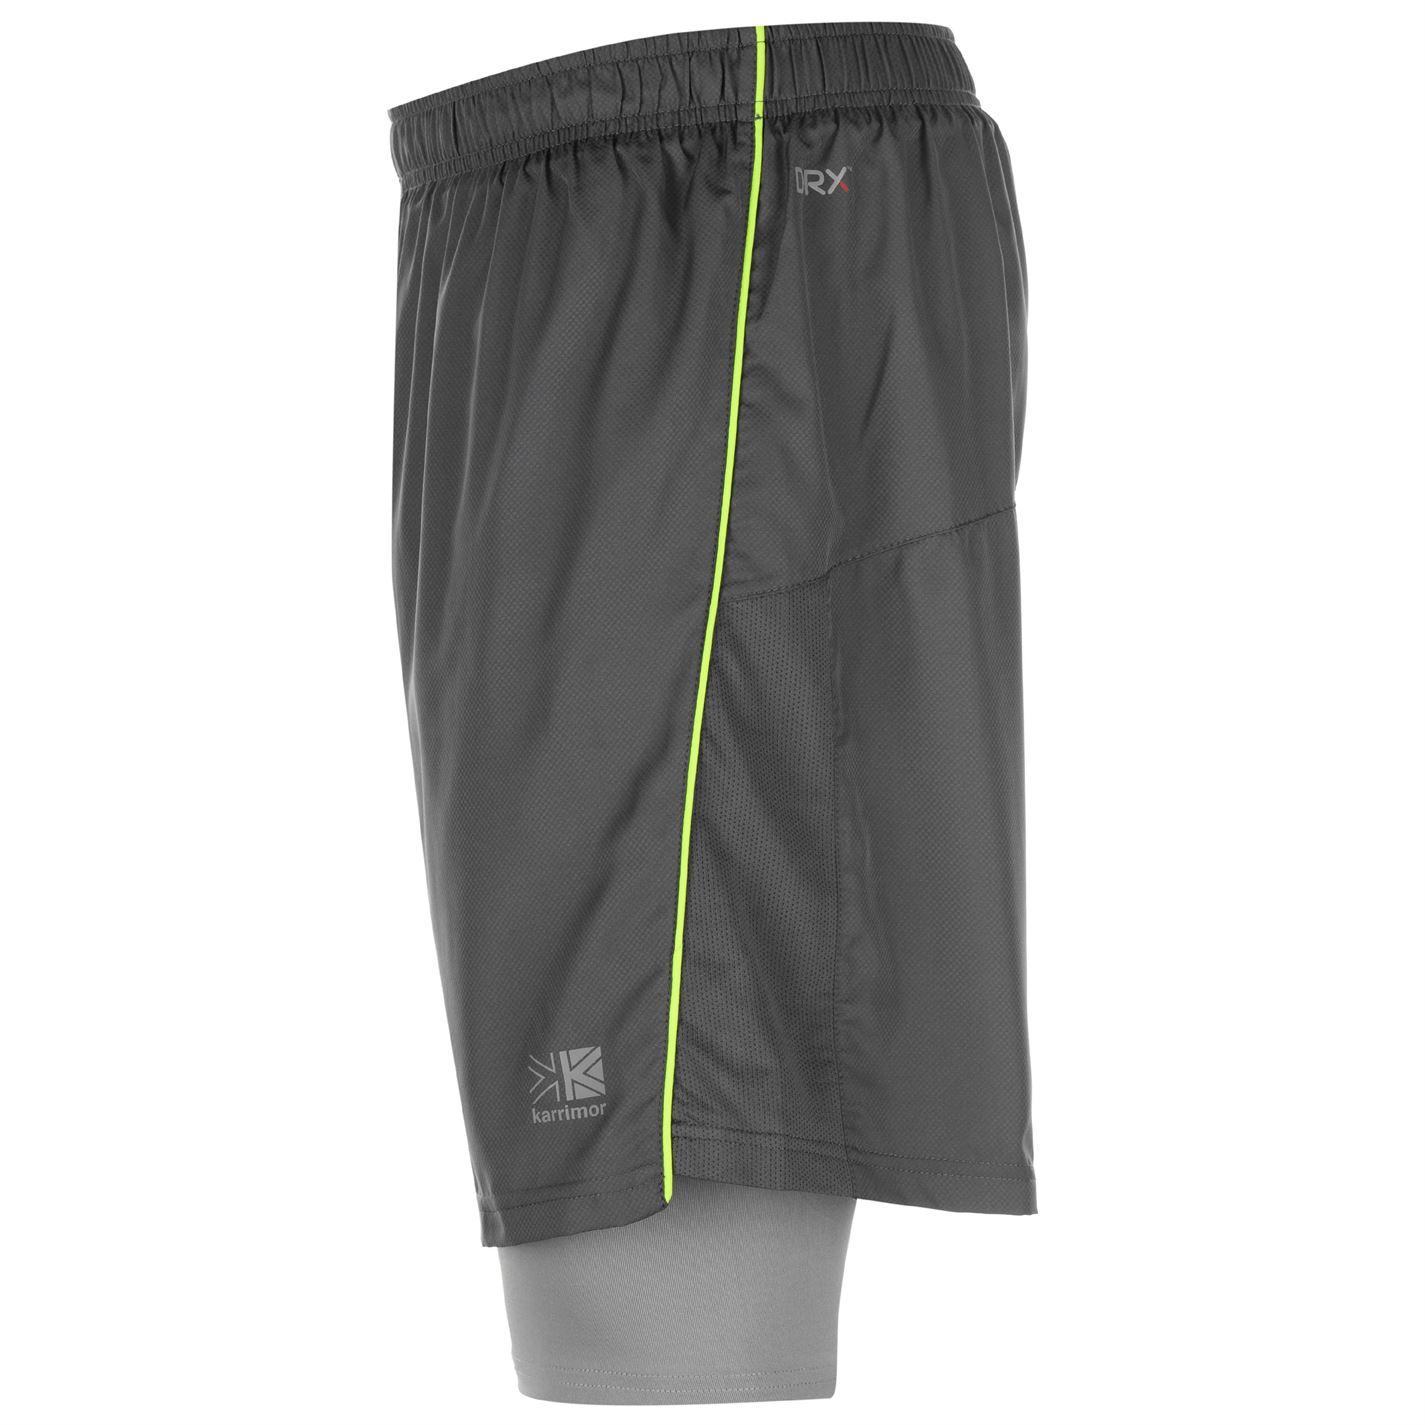 Karrimor-XLite-2in1-Shorts-Performance-Mens thumbnail 20